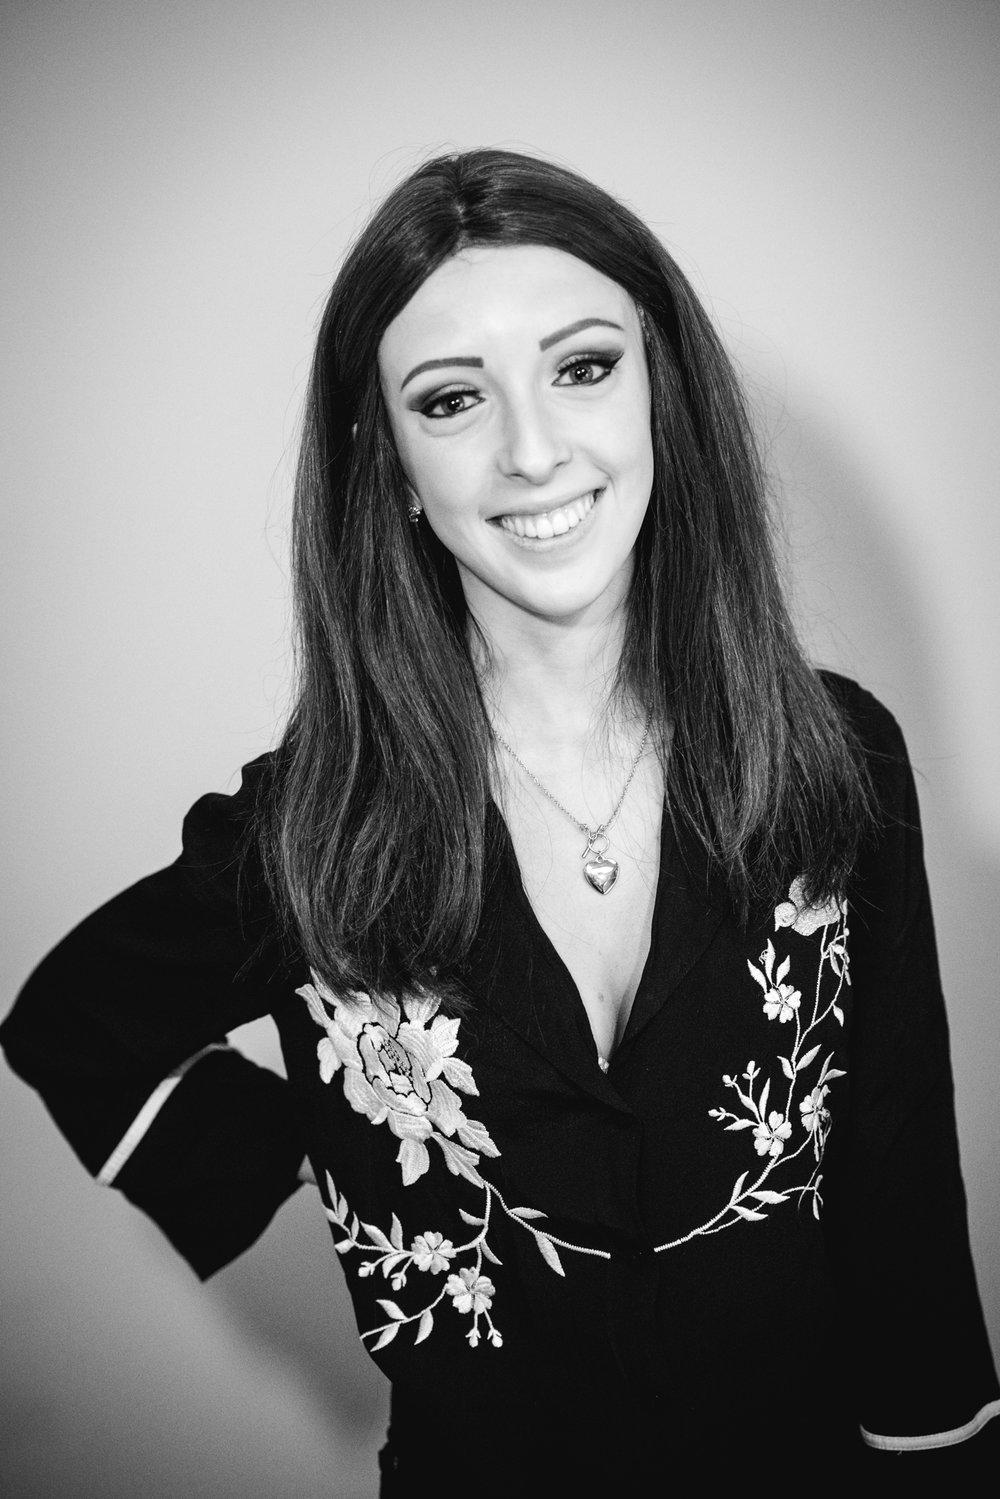 Anna Callahan, Auction and Raffle Manager